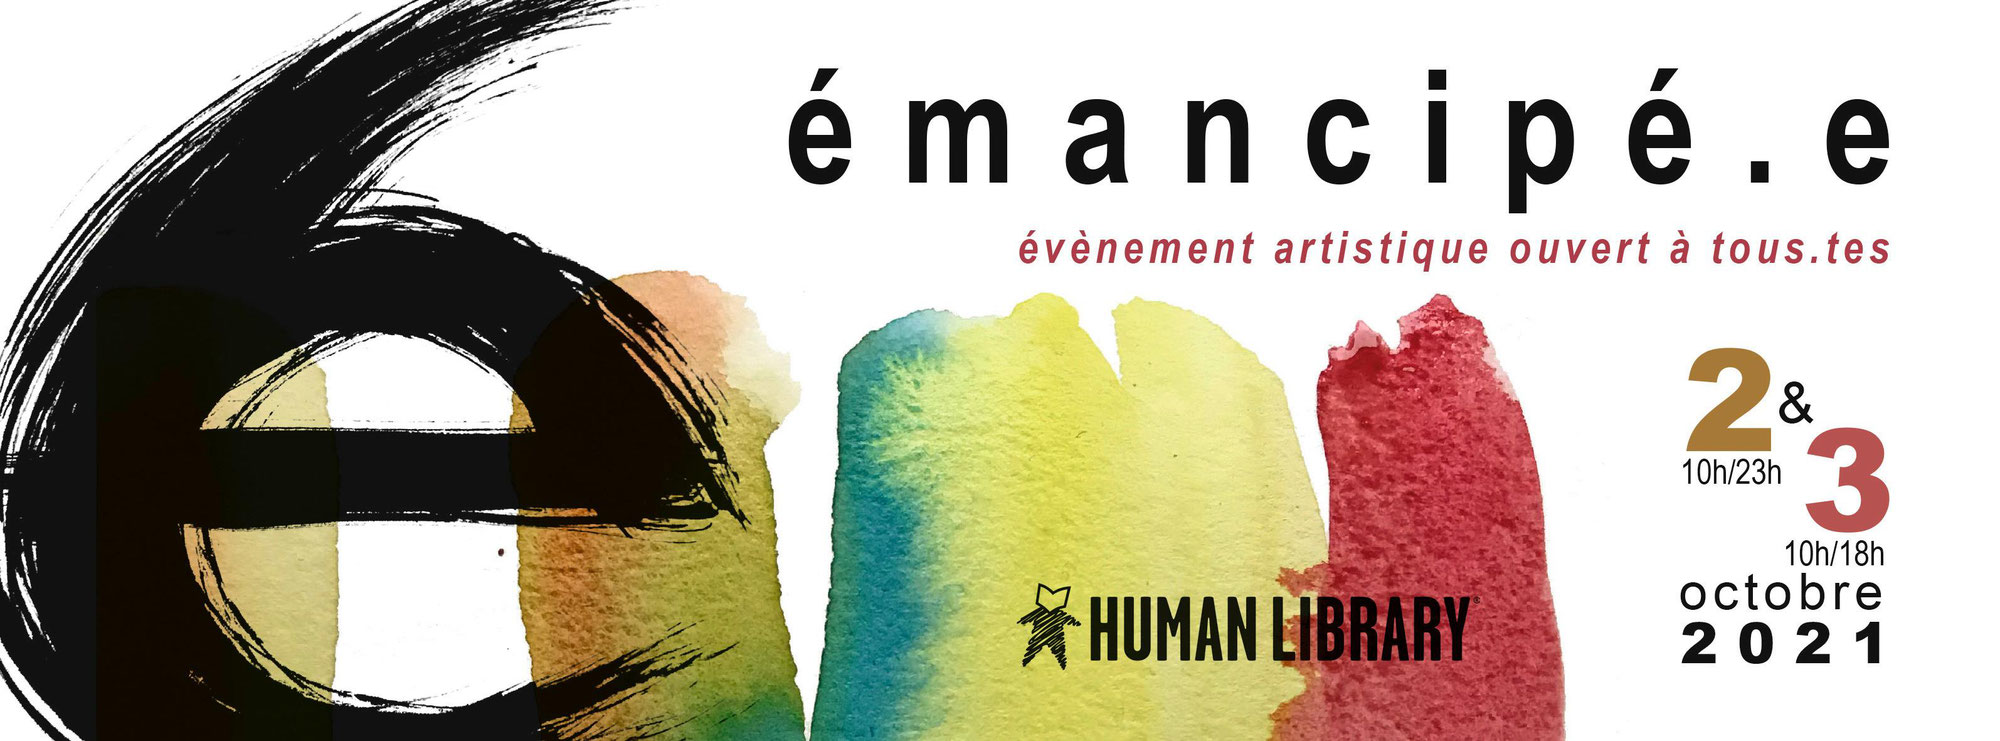 Emancipé.e : Festival artistique et social les 2-3 Octobre 2021 !